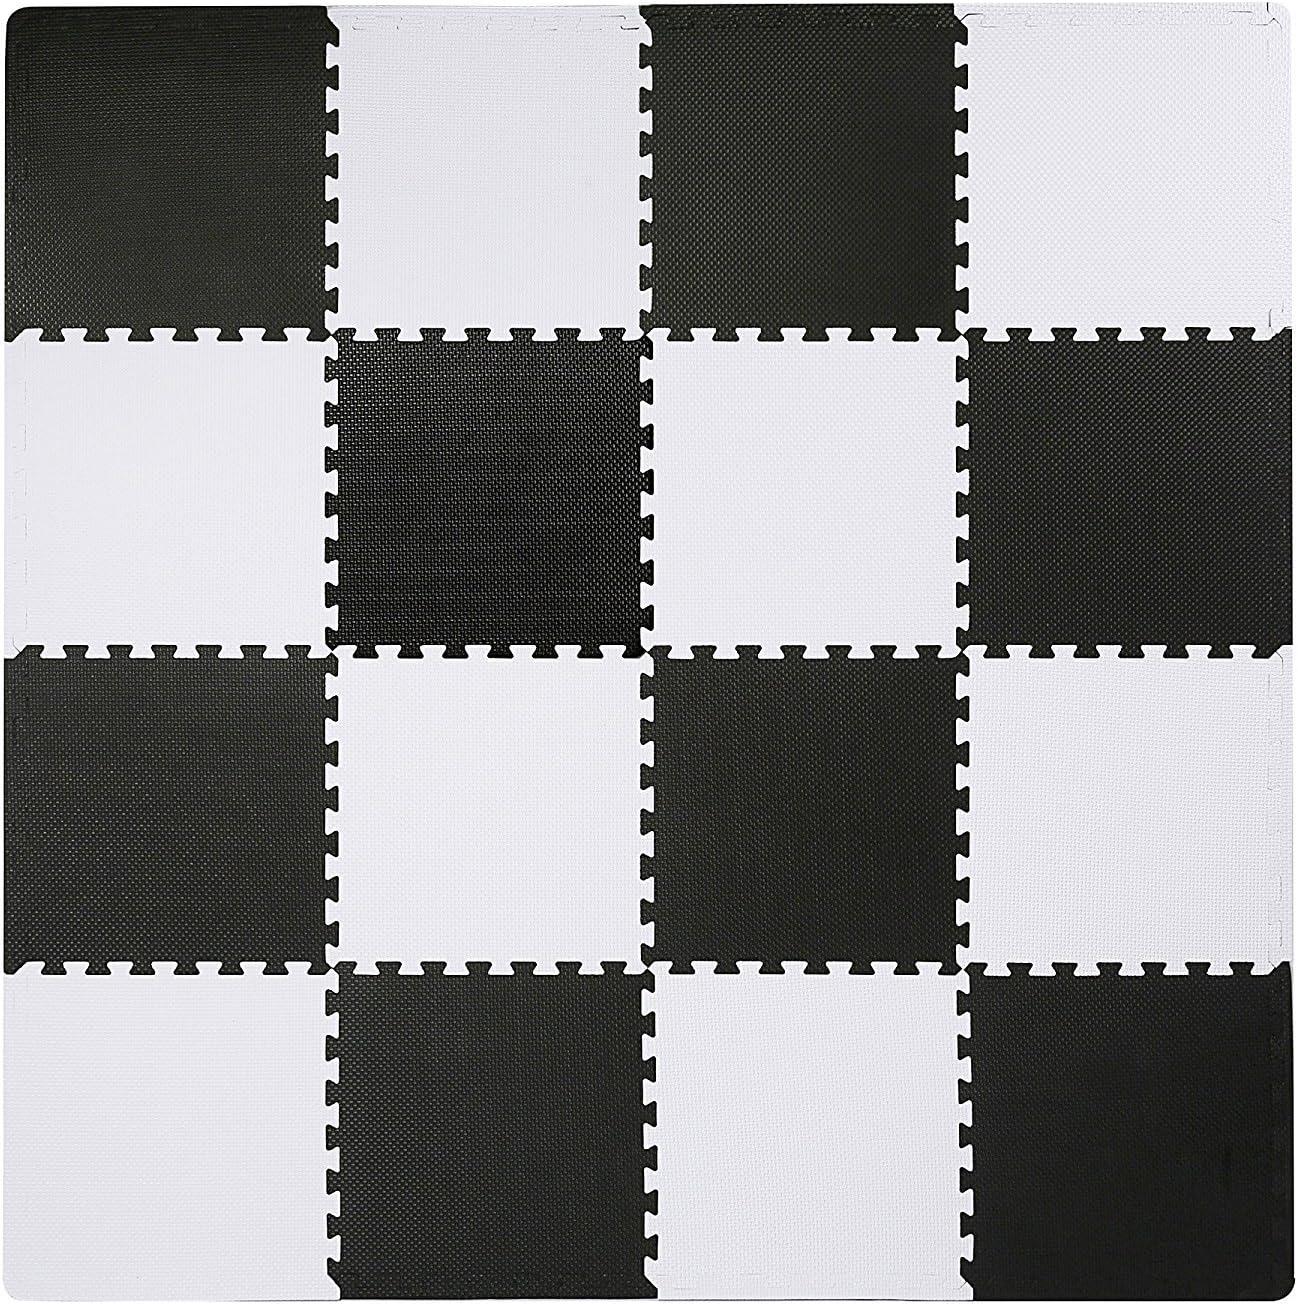 Superjare Interlocking Floor Tiles, 16 Tiles EVA Foam Puzzle Mat with Borders - White and Black: Toys & Games